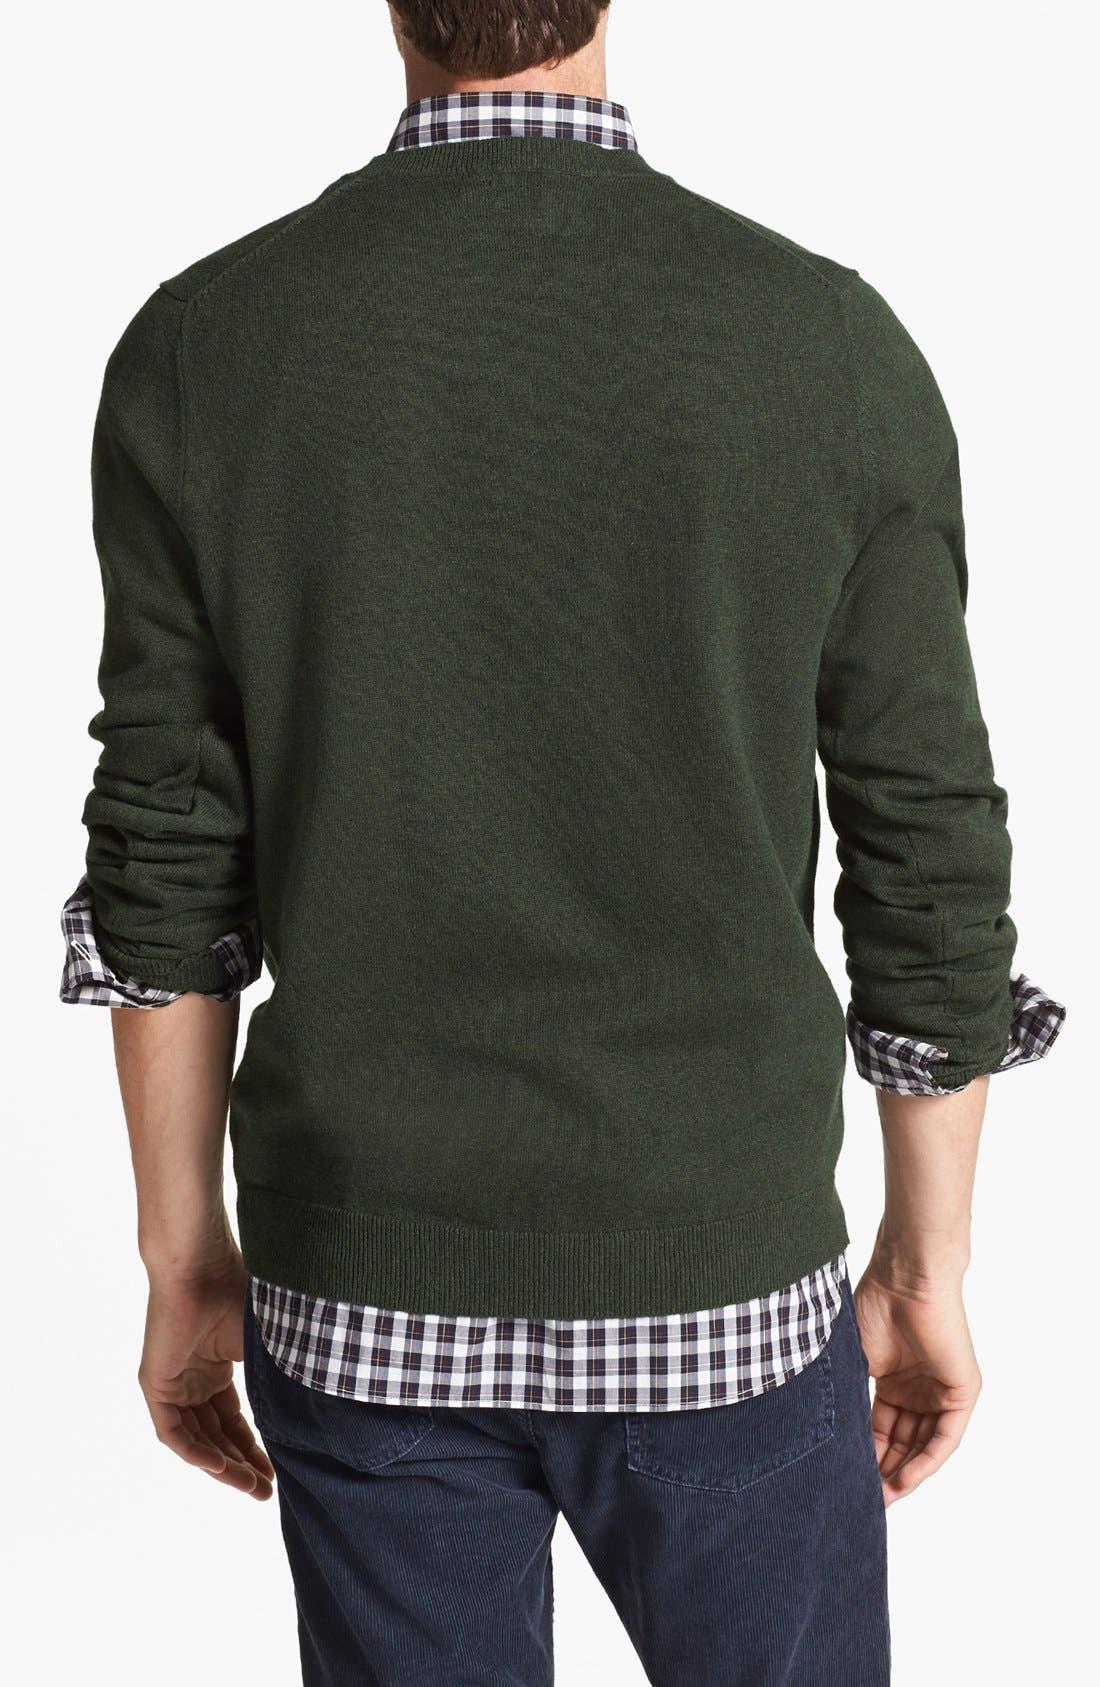 Alternate Image 2  - Wallin & Bros. Trim Fit Cotton & Cashmere Crewneck Sweater